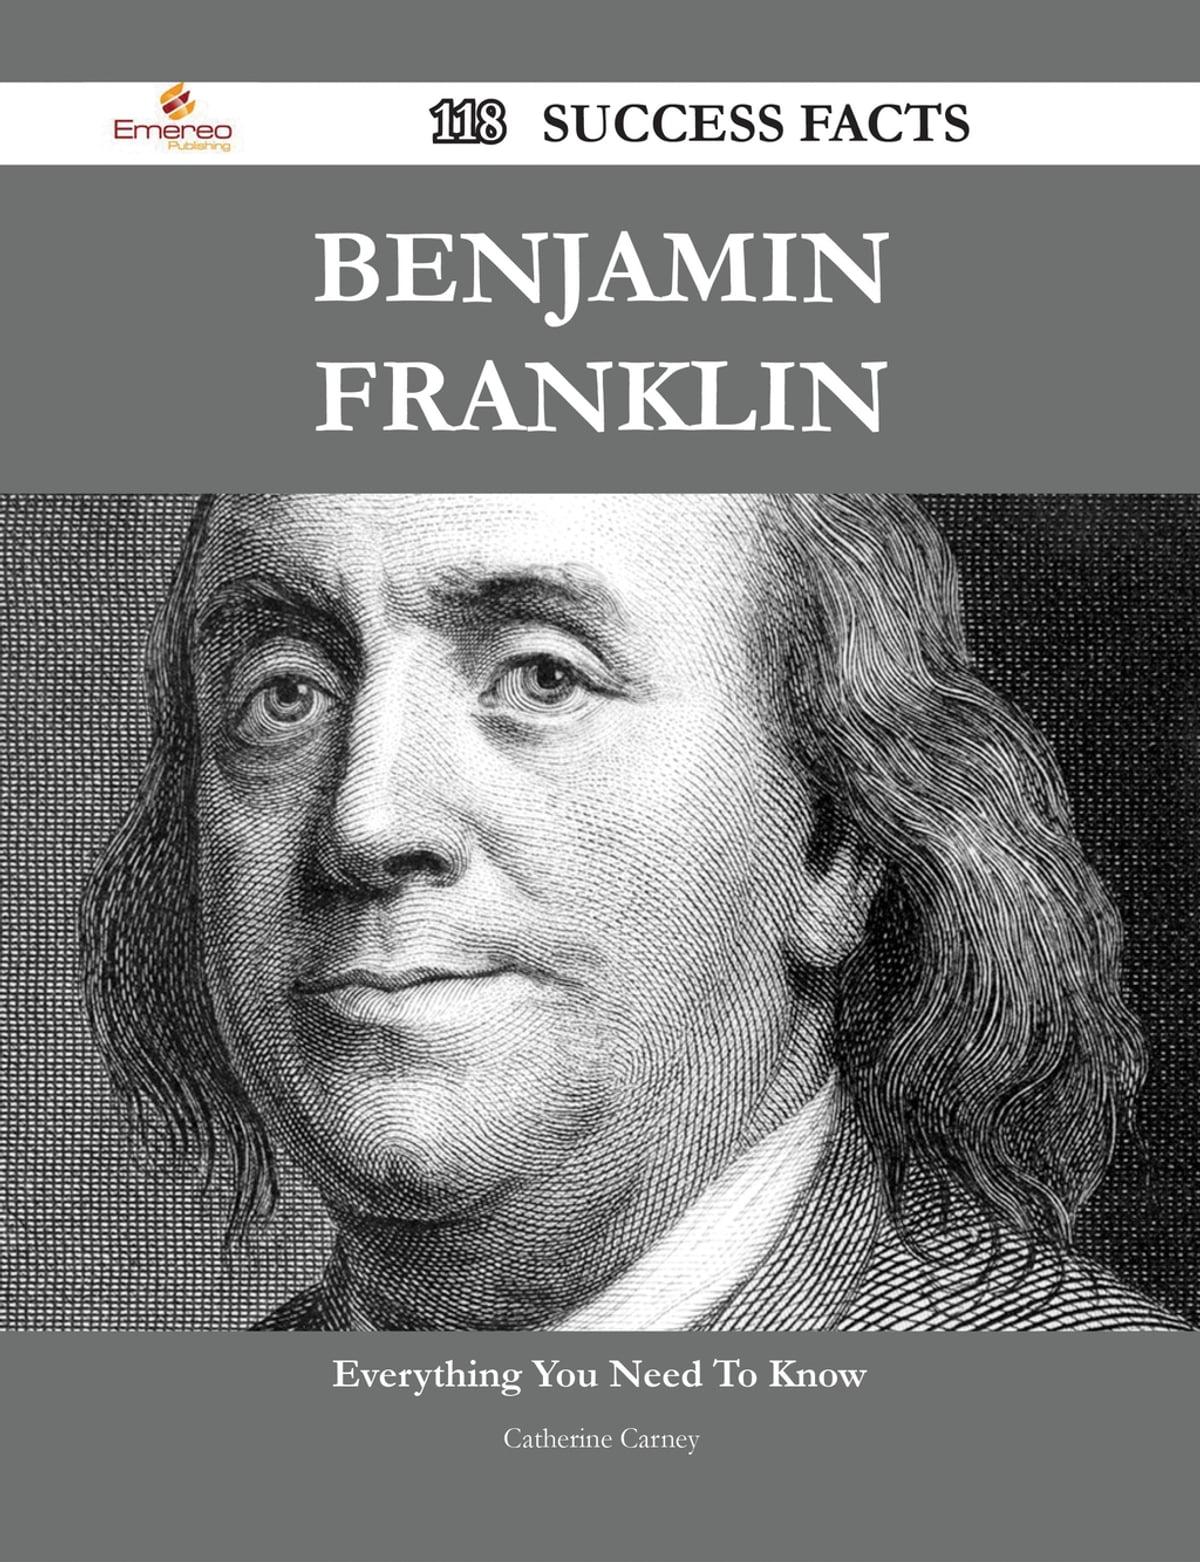 Benjamin Franklin 118 Success Facts